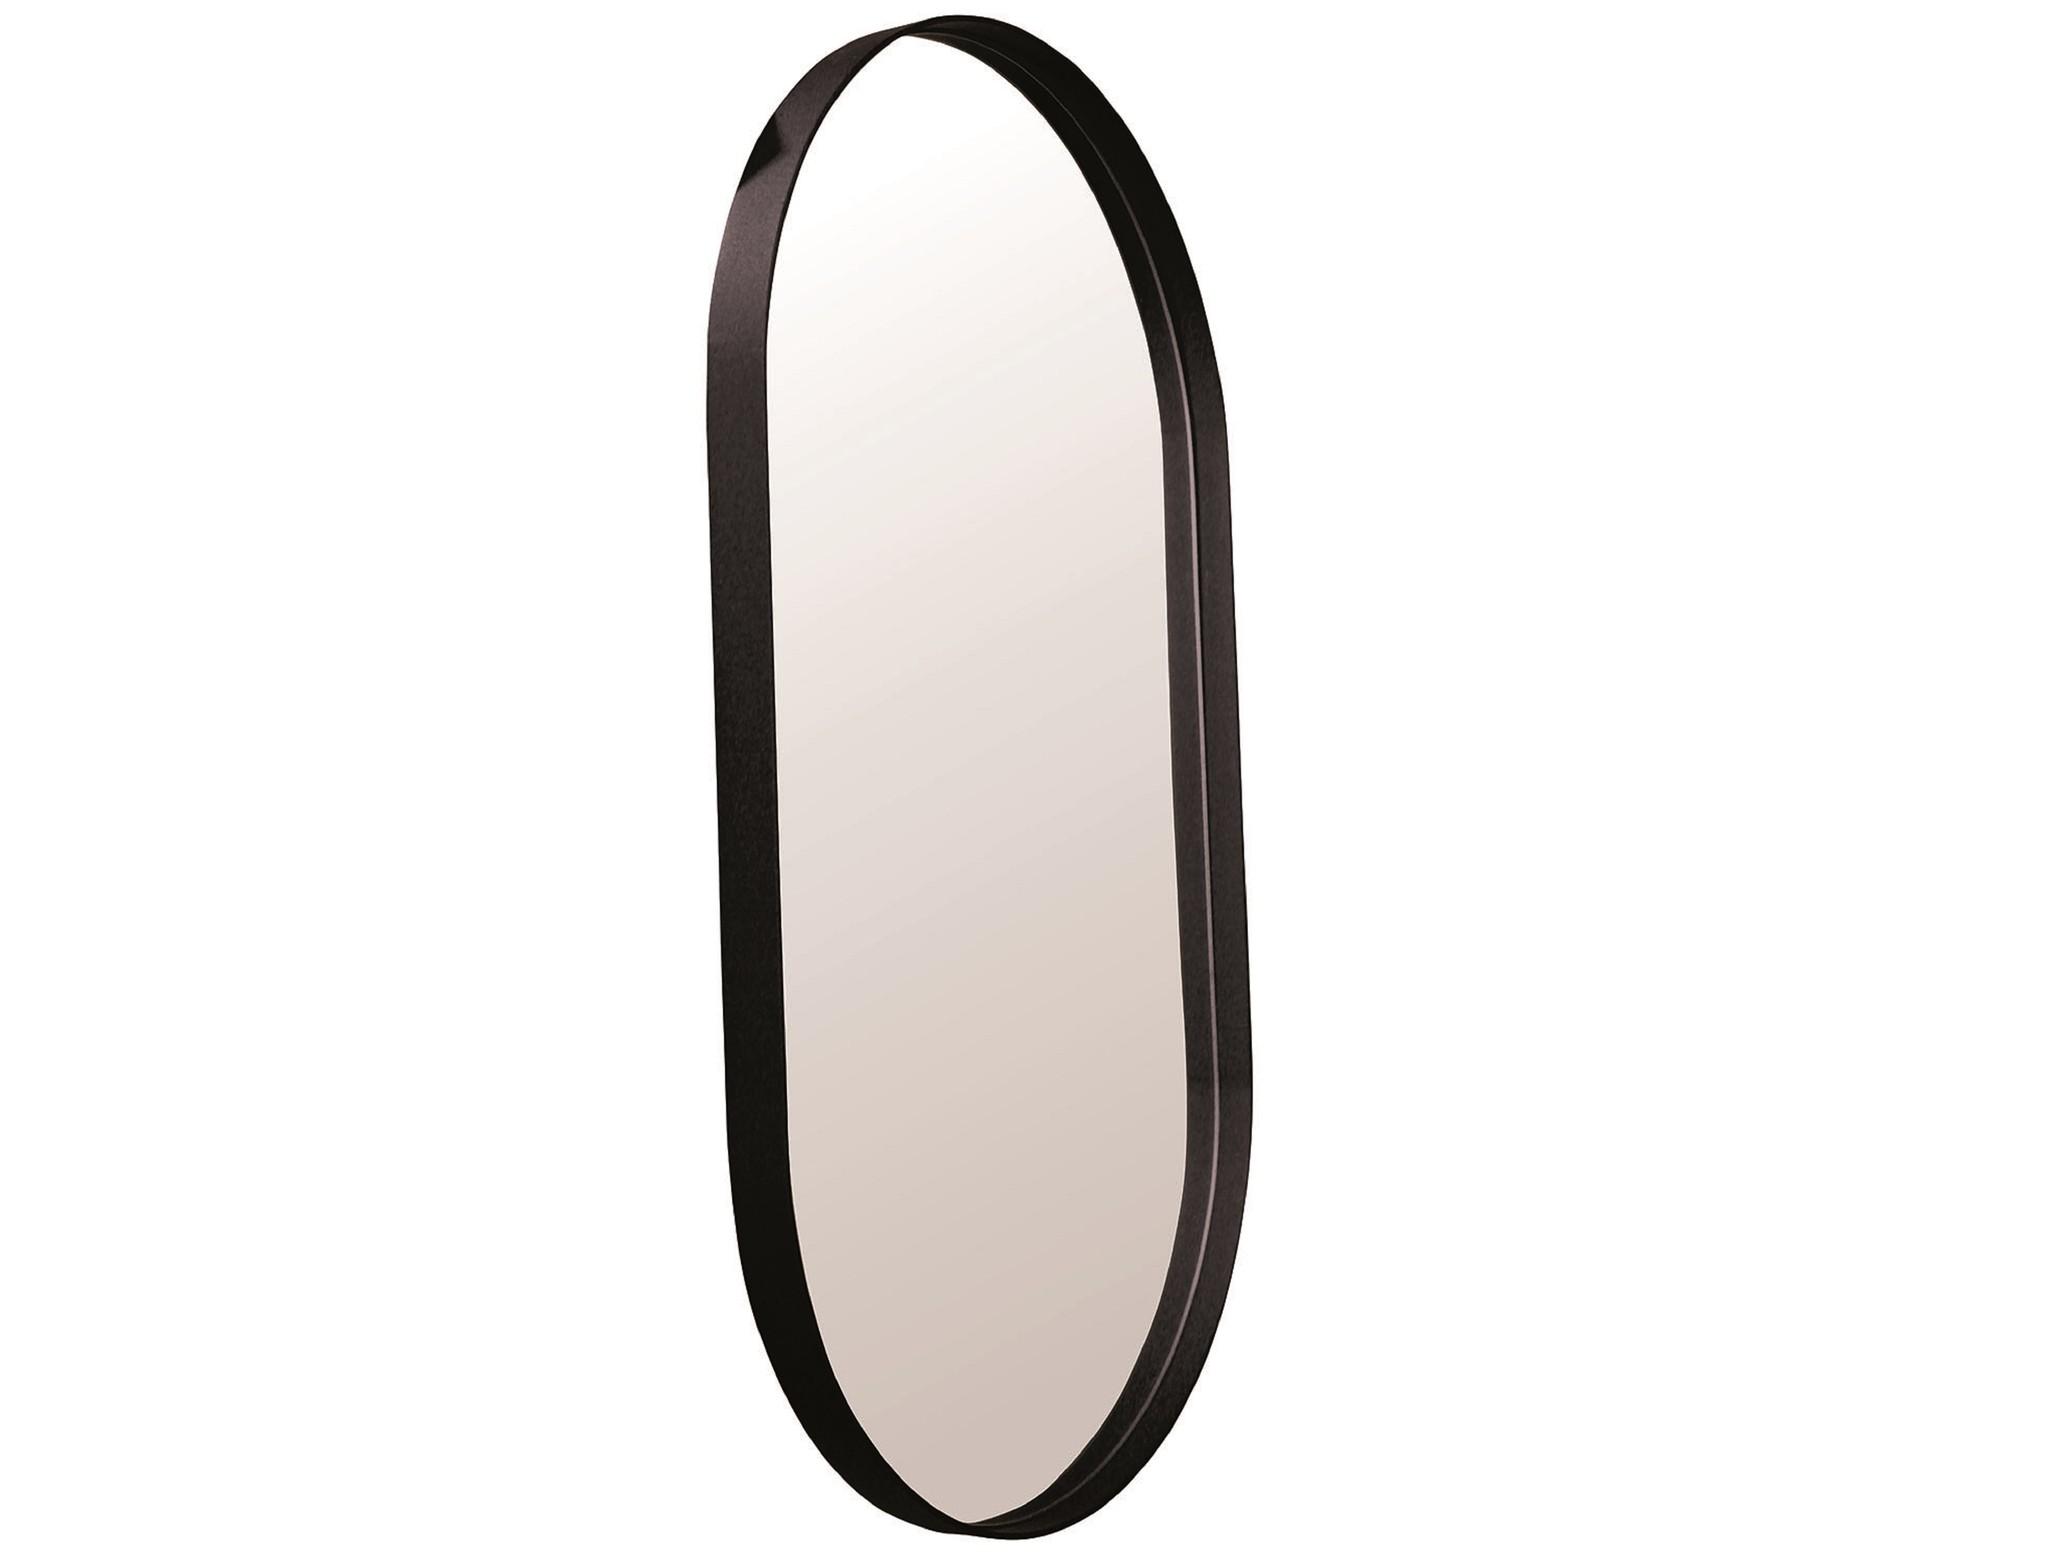 Настенное зеркало ванда 90*50 (simple mirror) черный 50.0x90.0x4.0 см.